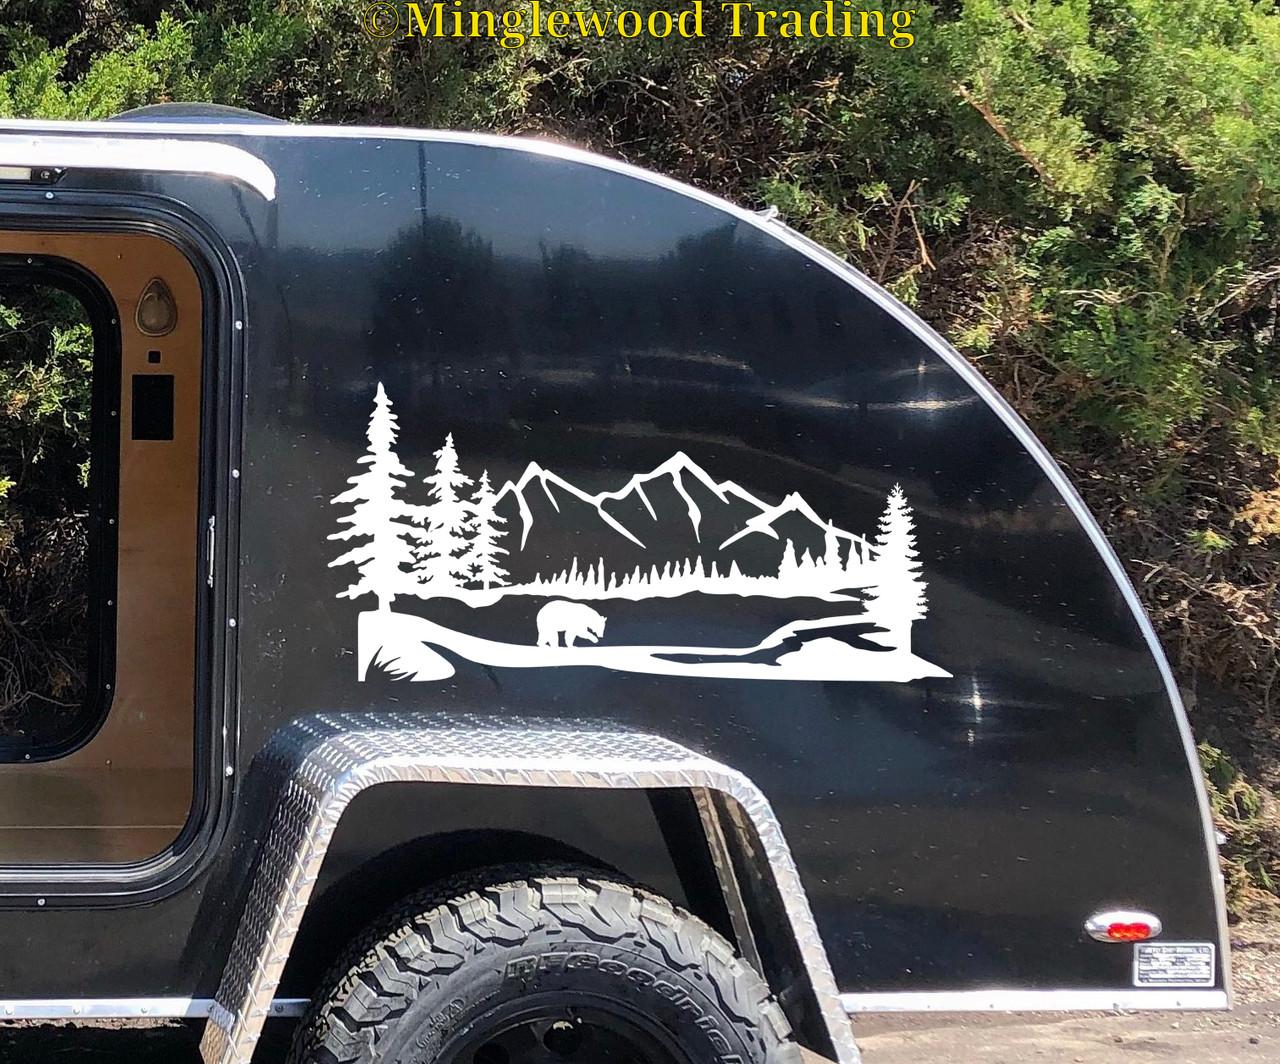 Bear Mountain Trees Scene Vinyl Sticker - Camper RV Travel Trailer Graphics - Die Cut Decal